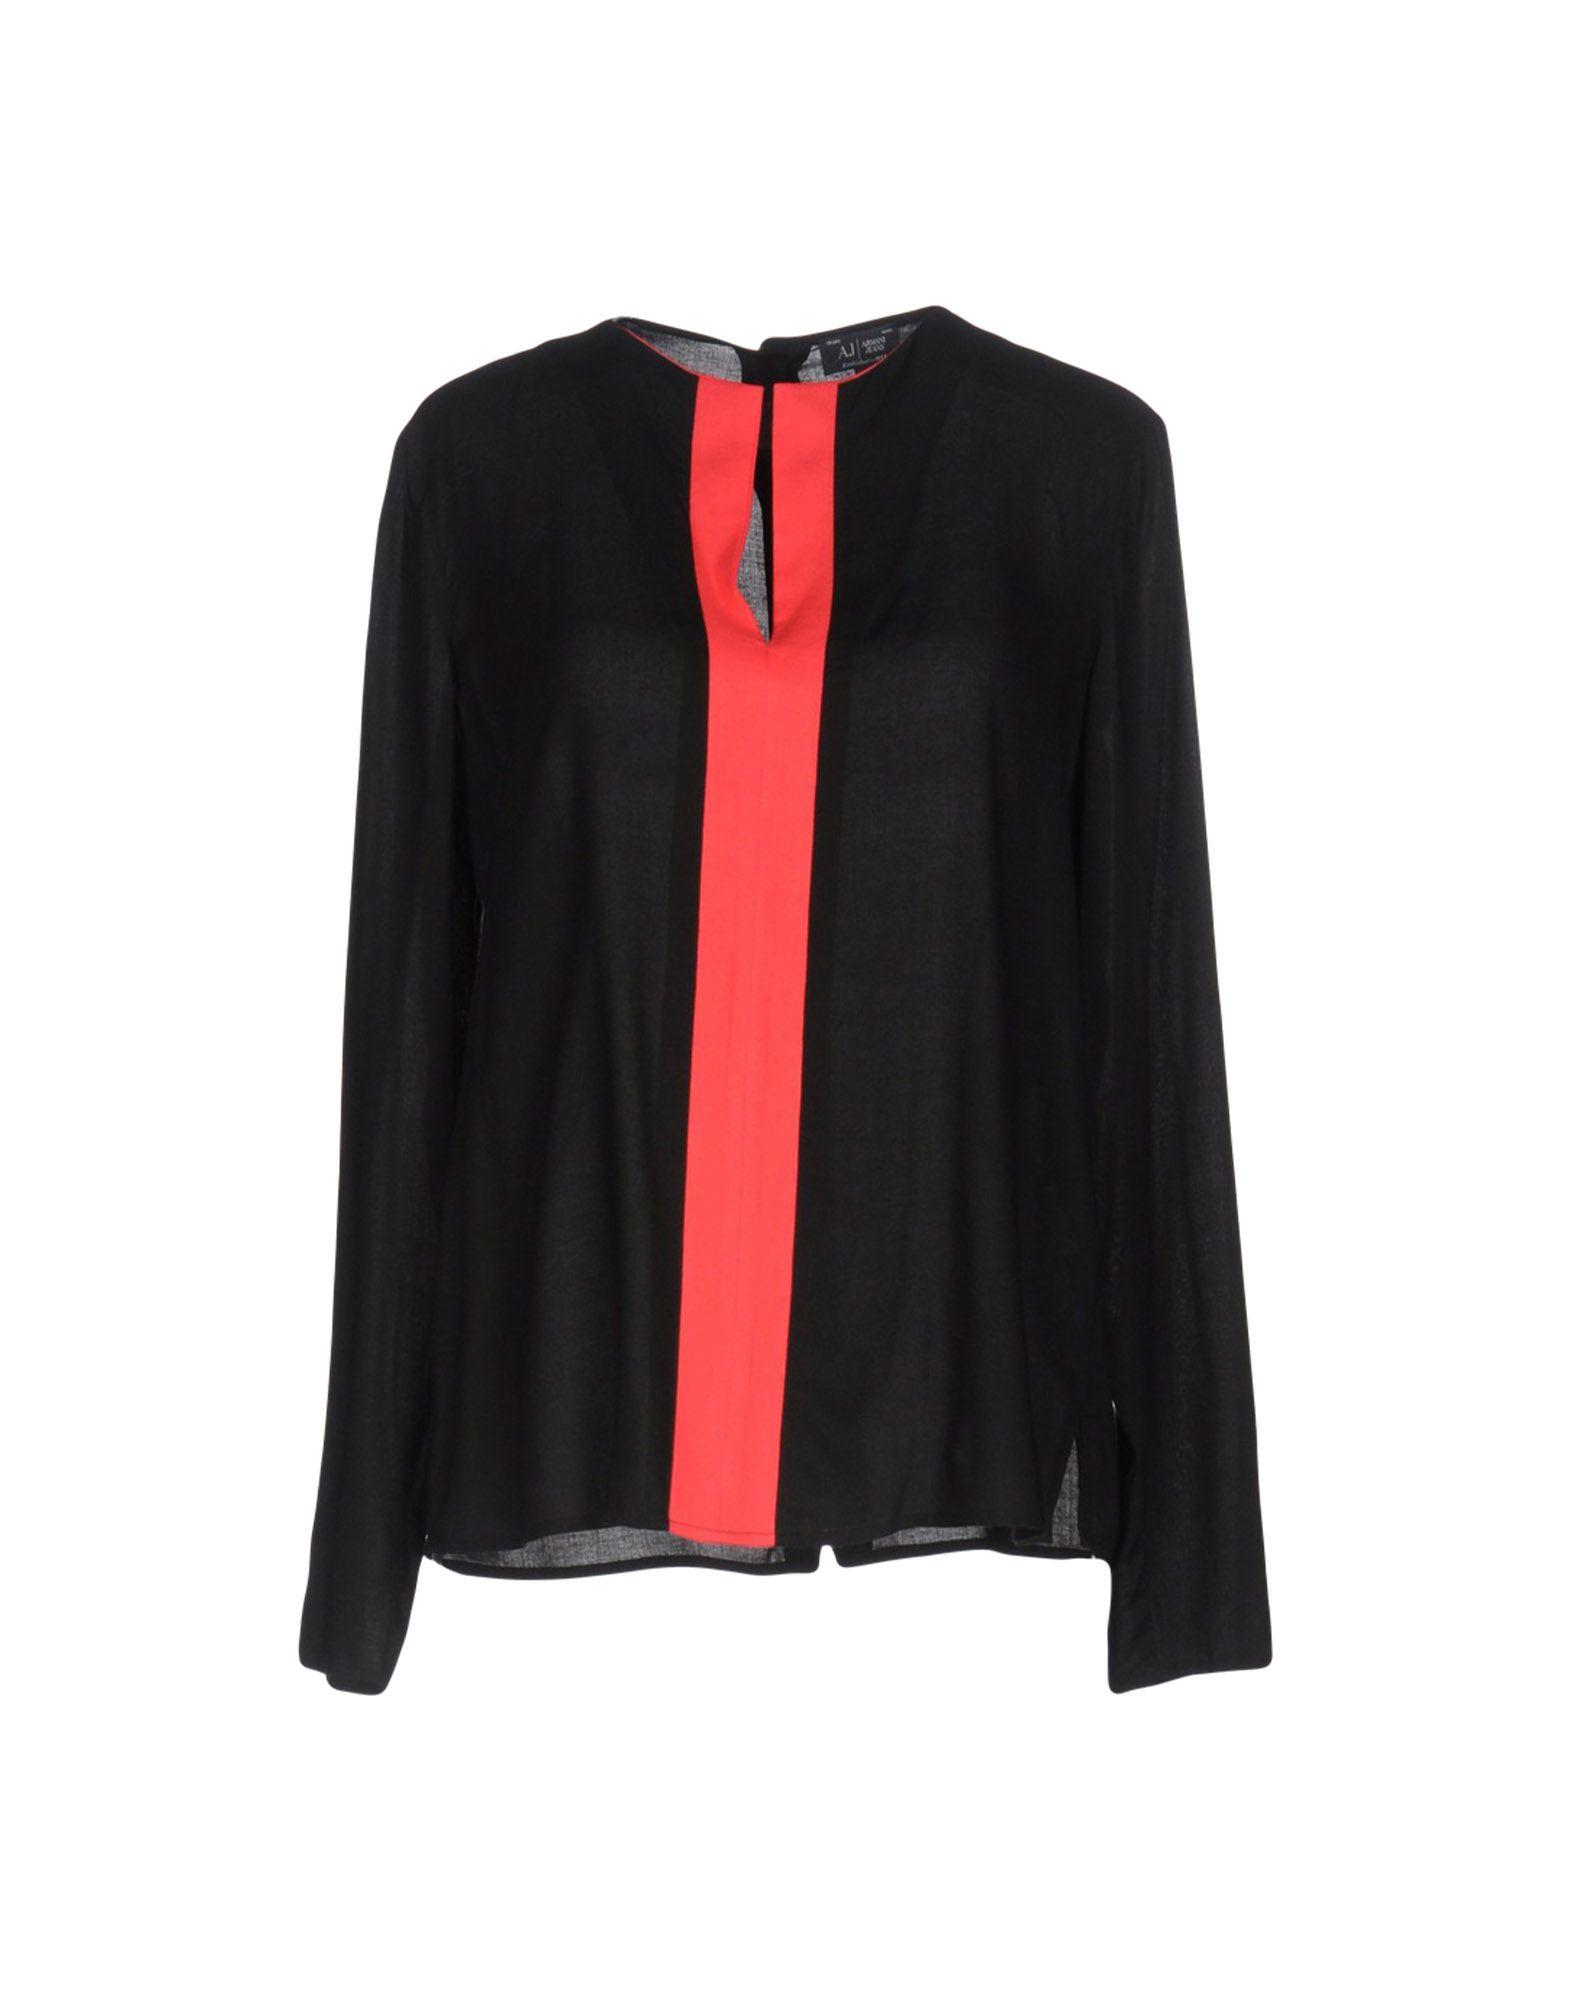 ARMANI JEANS Damen Bluse Farbe Schwarz Größe 3